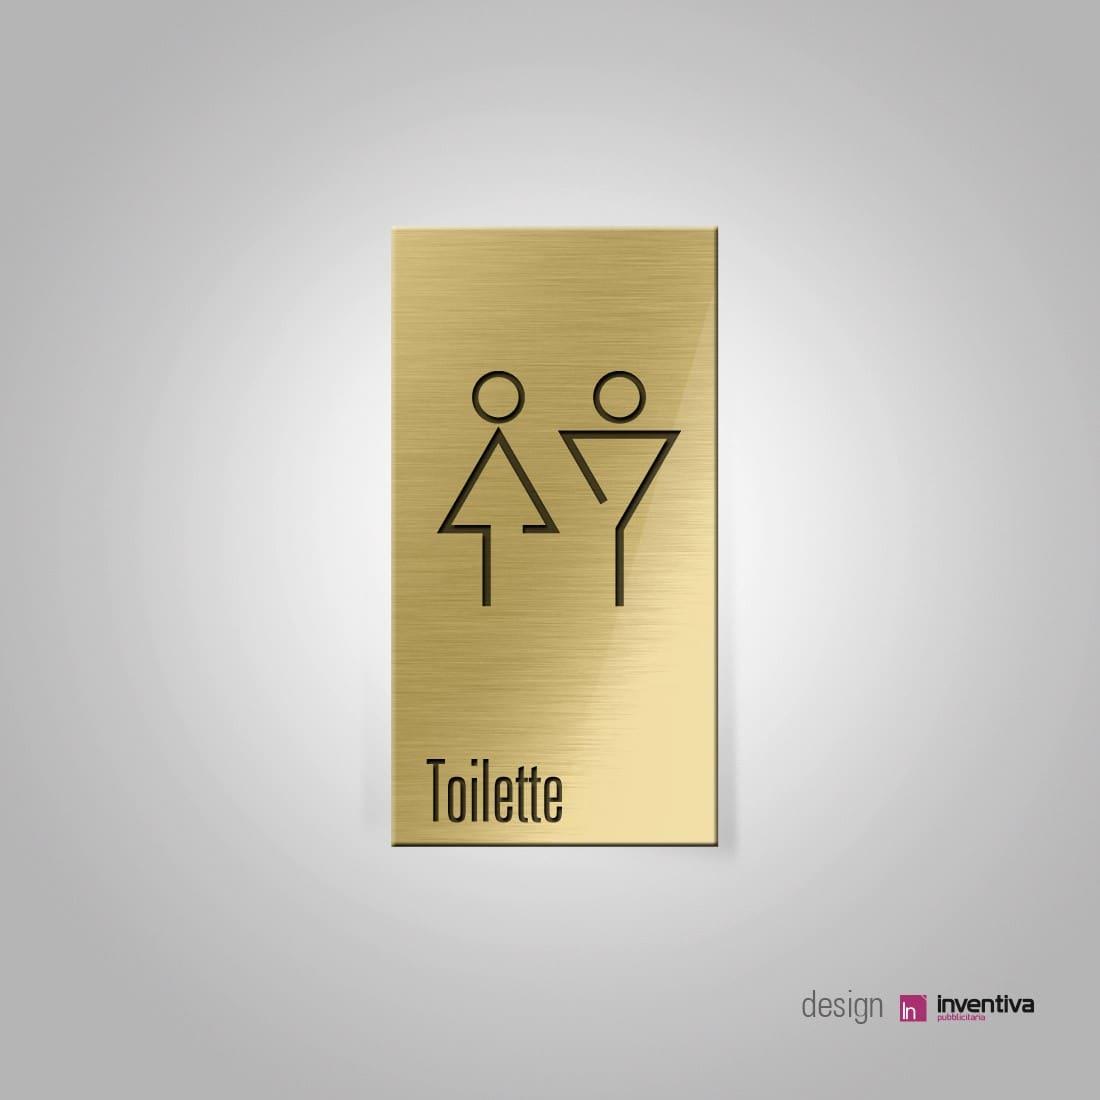 Segnaletica toilette  cartelli in stile Drink